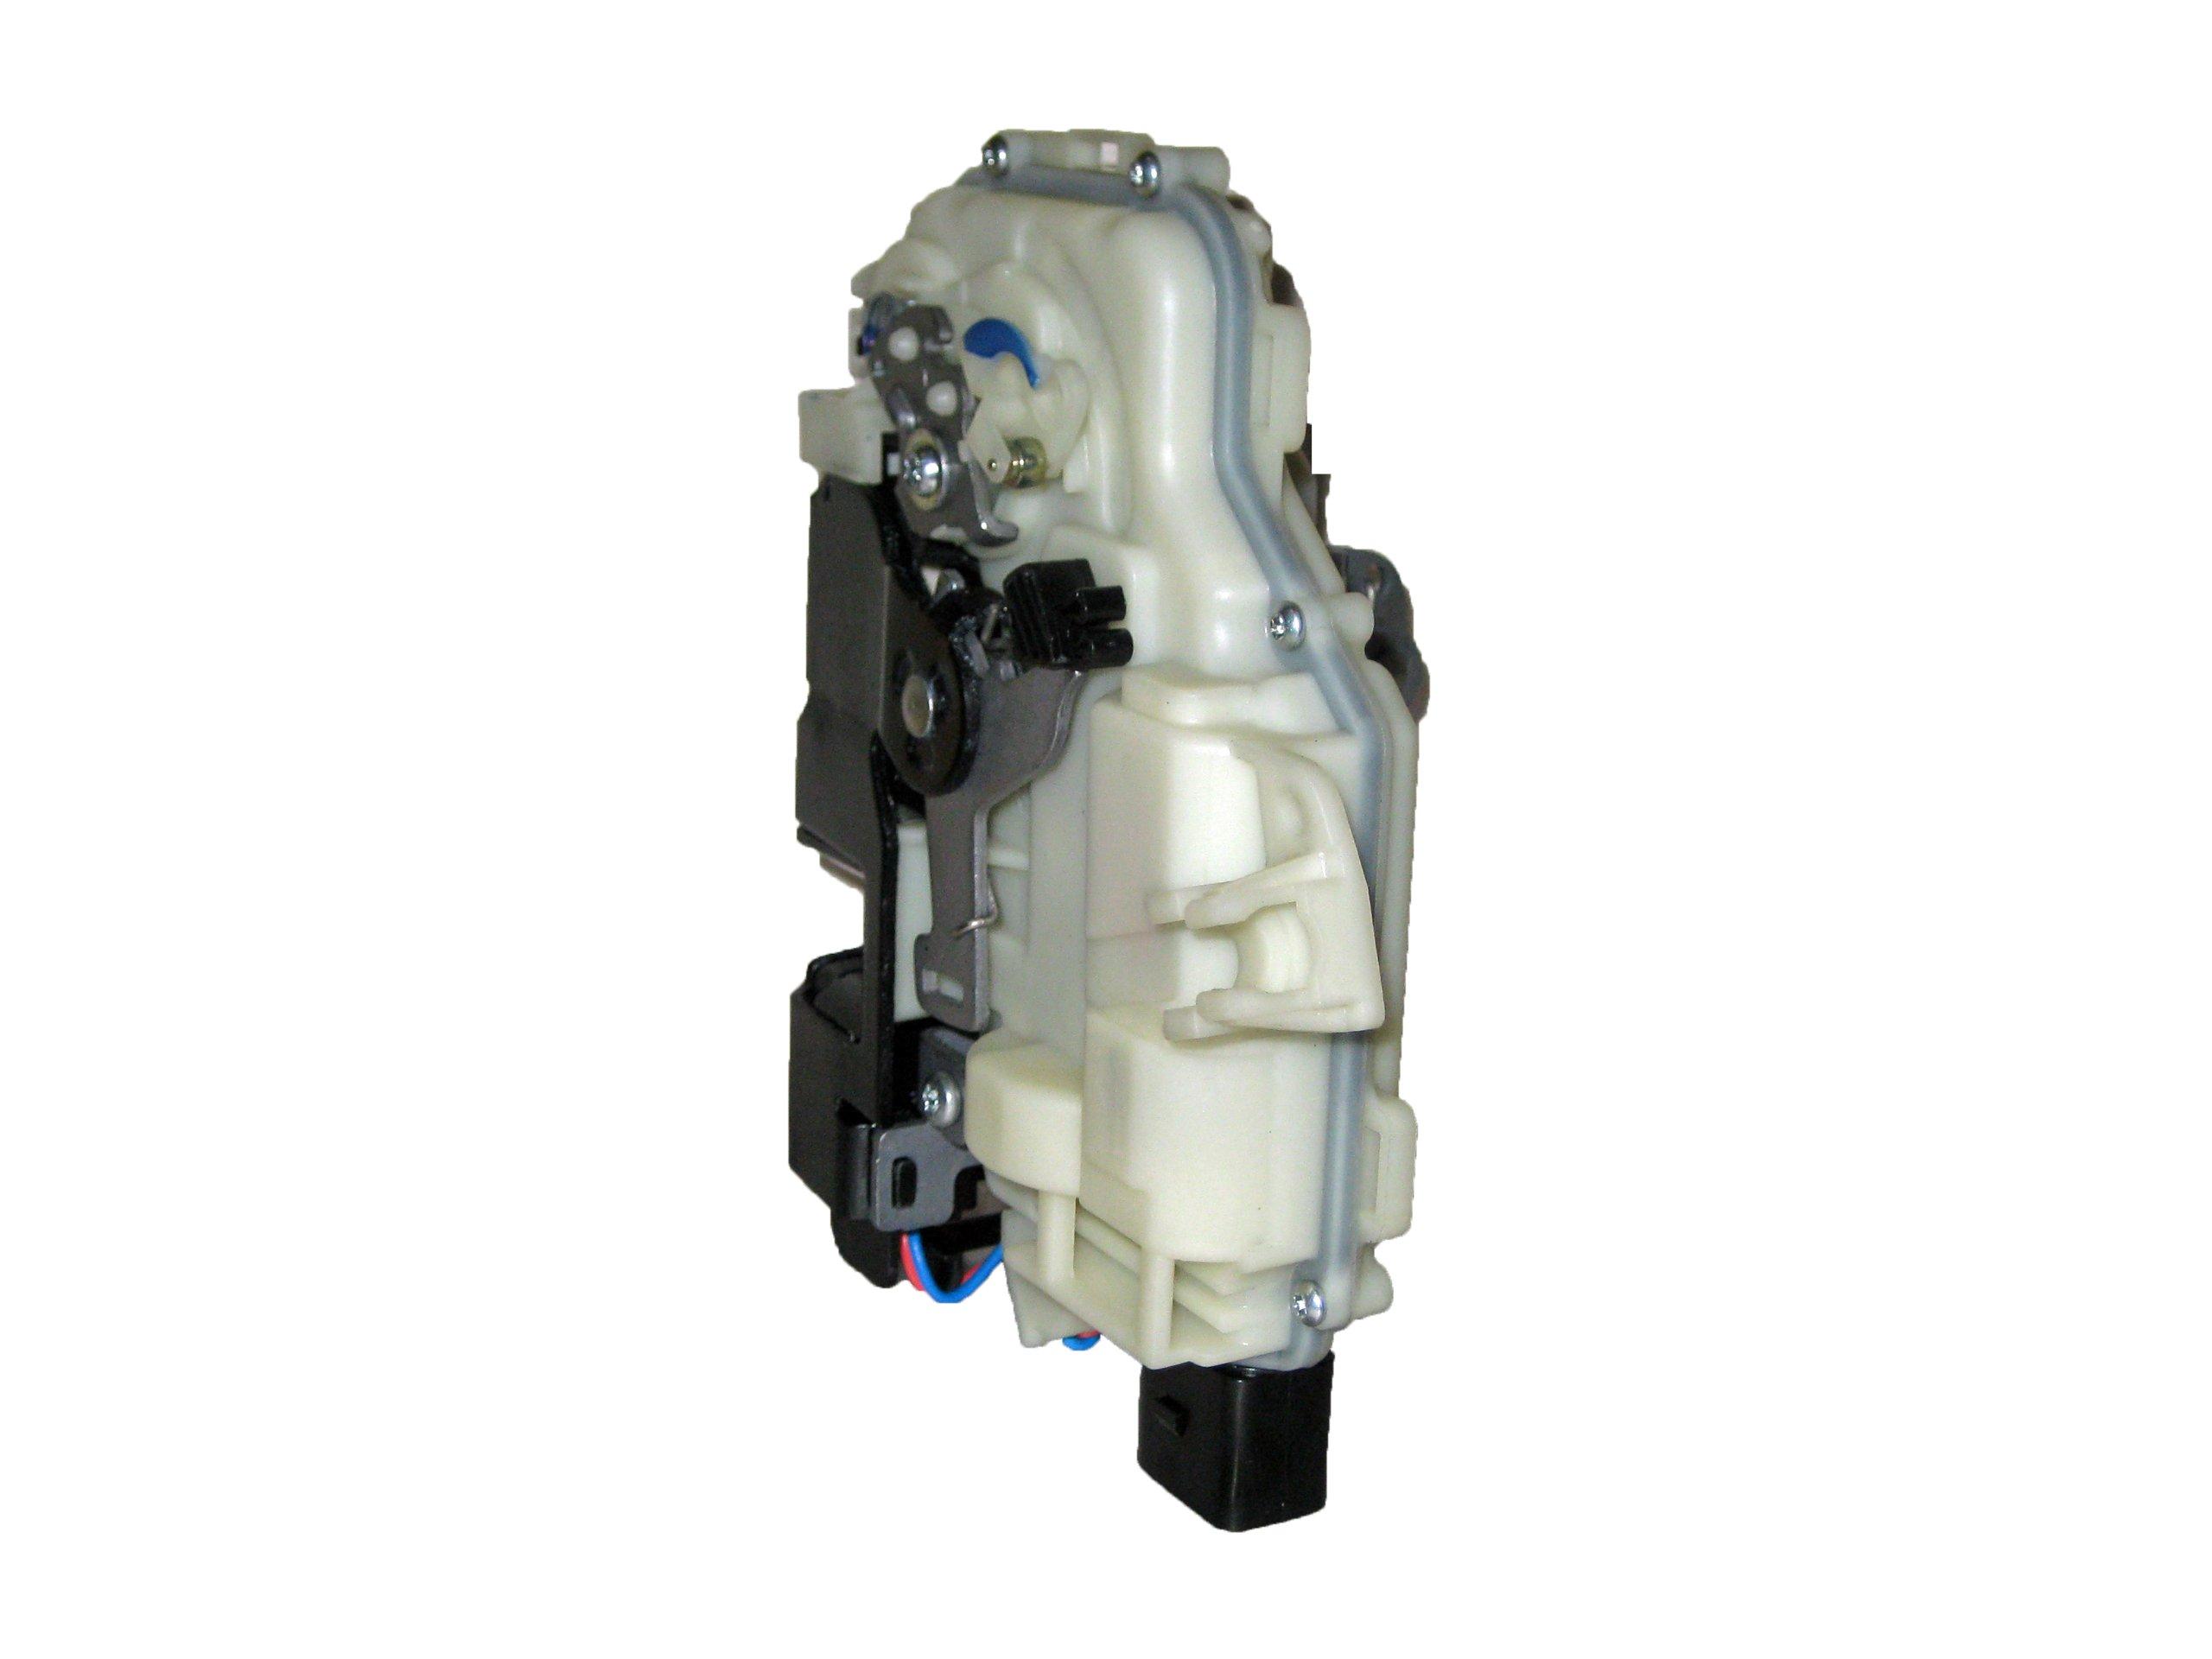 Door Lock Assembly OE Supplier 3B1837015AS Volkswagen Beetle Jetta Golf Passat